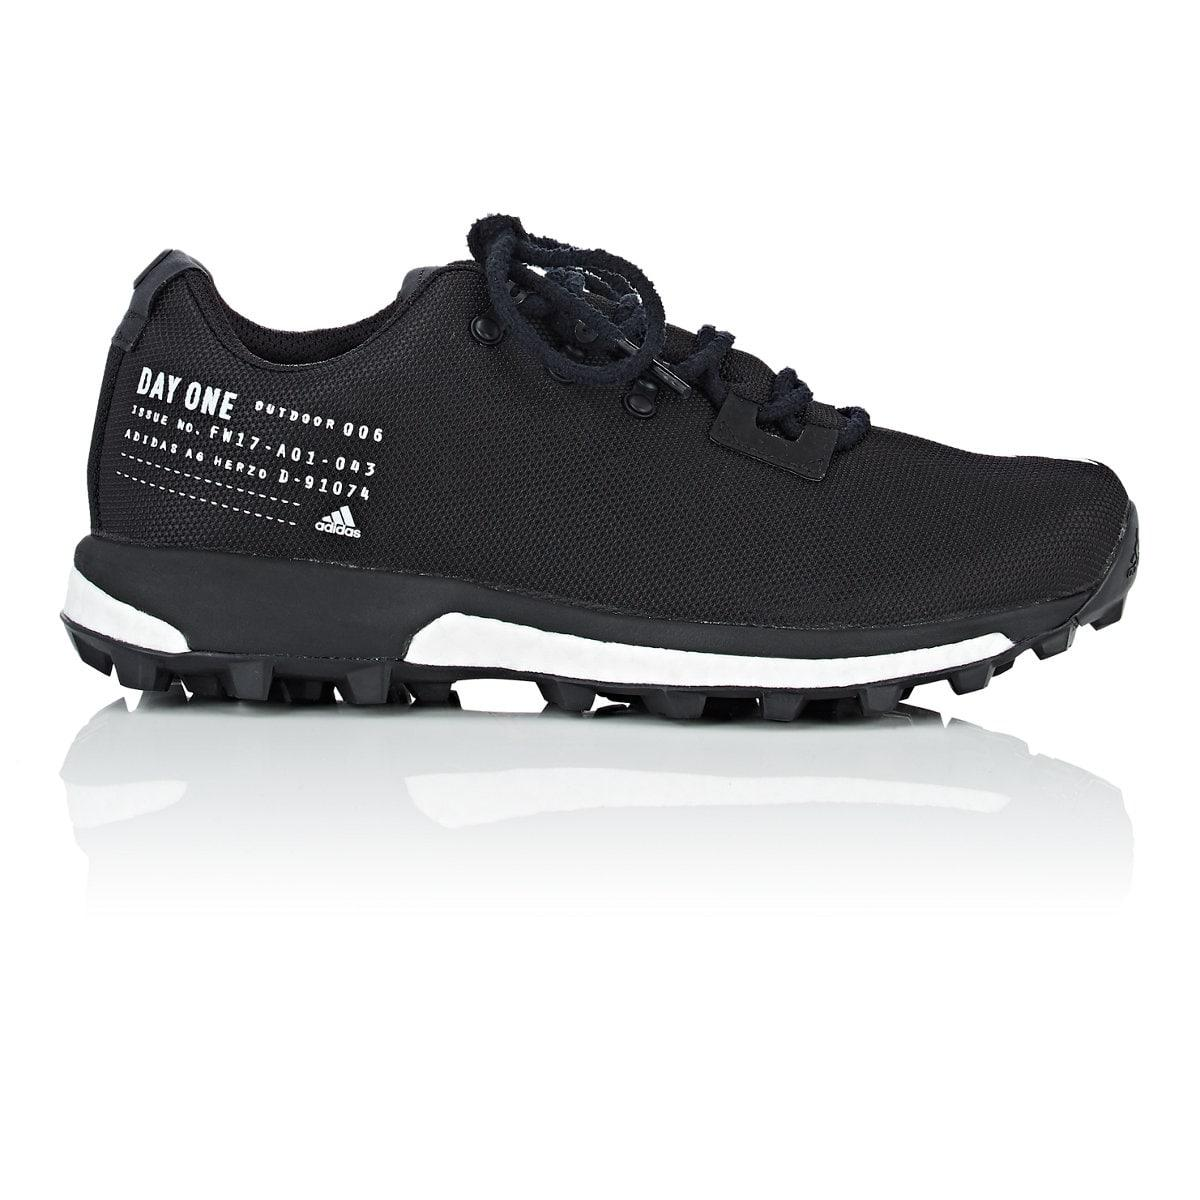 Mens Mens Ado Terrex Agravic Sneakers adidas hXS1r1iYHF